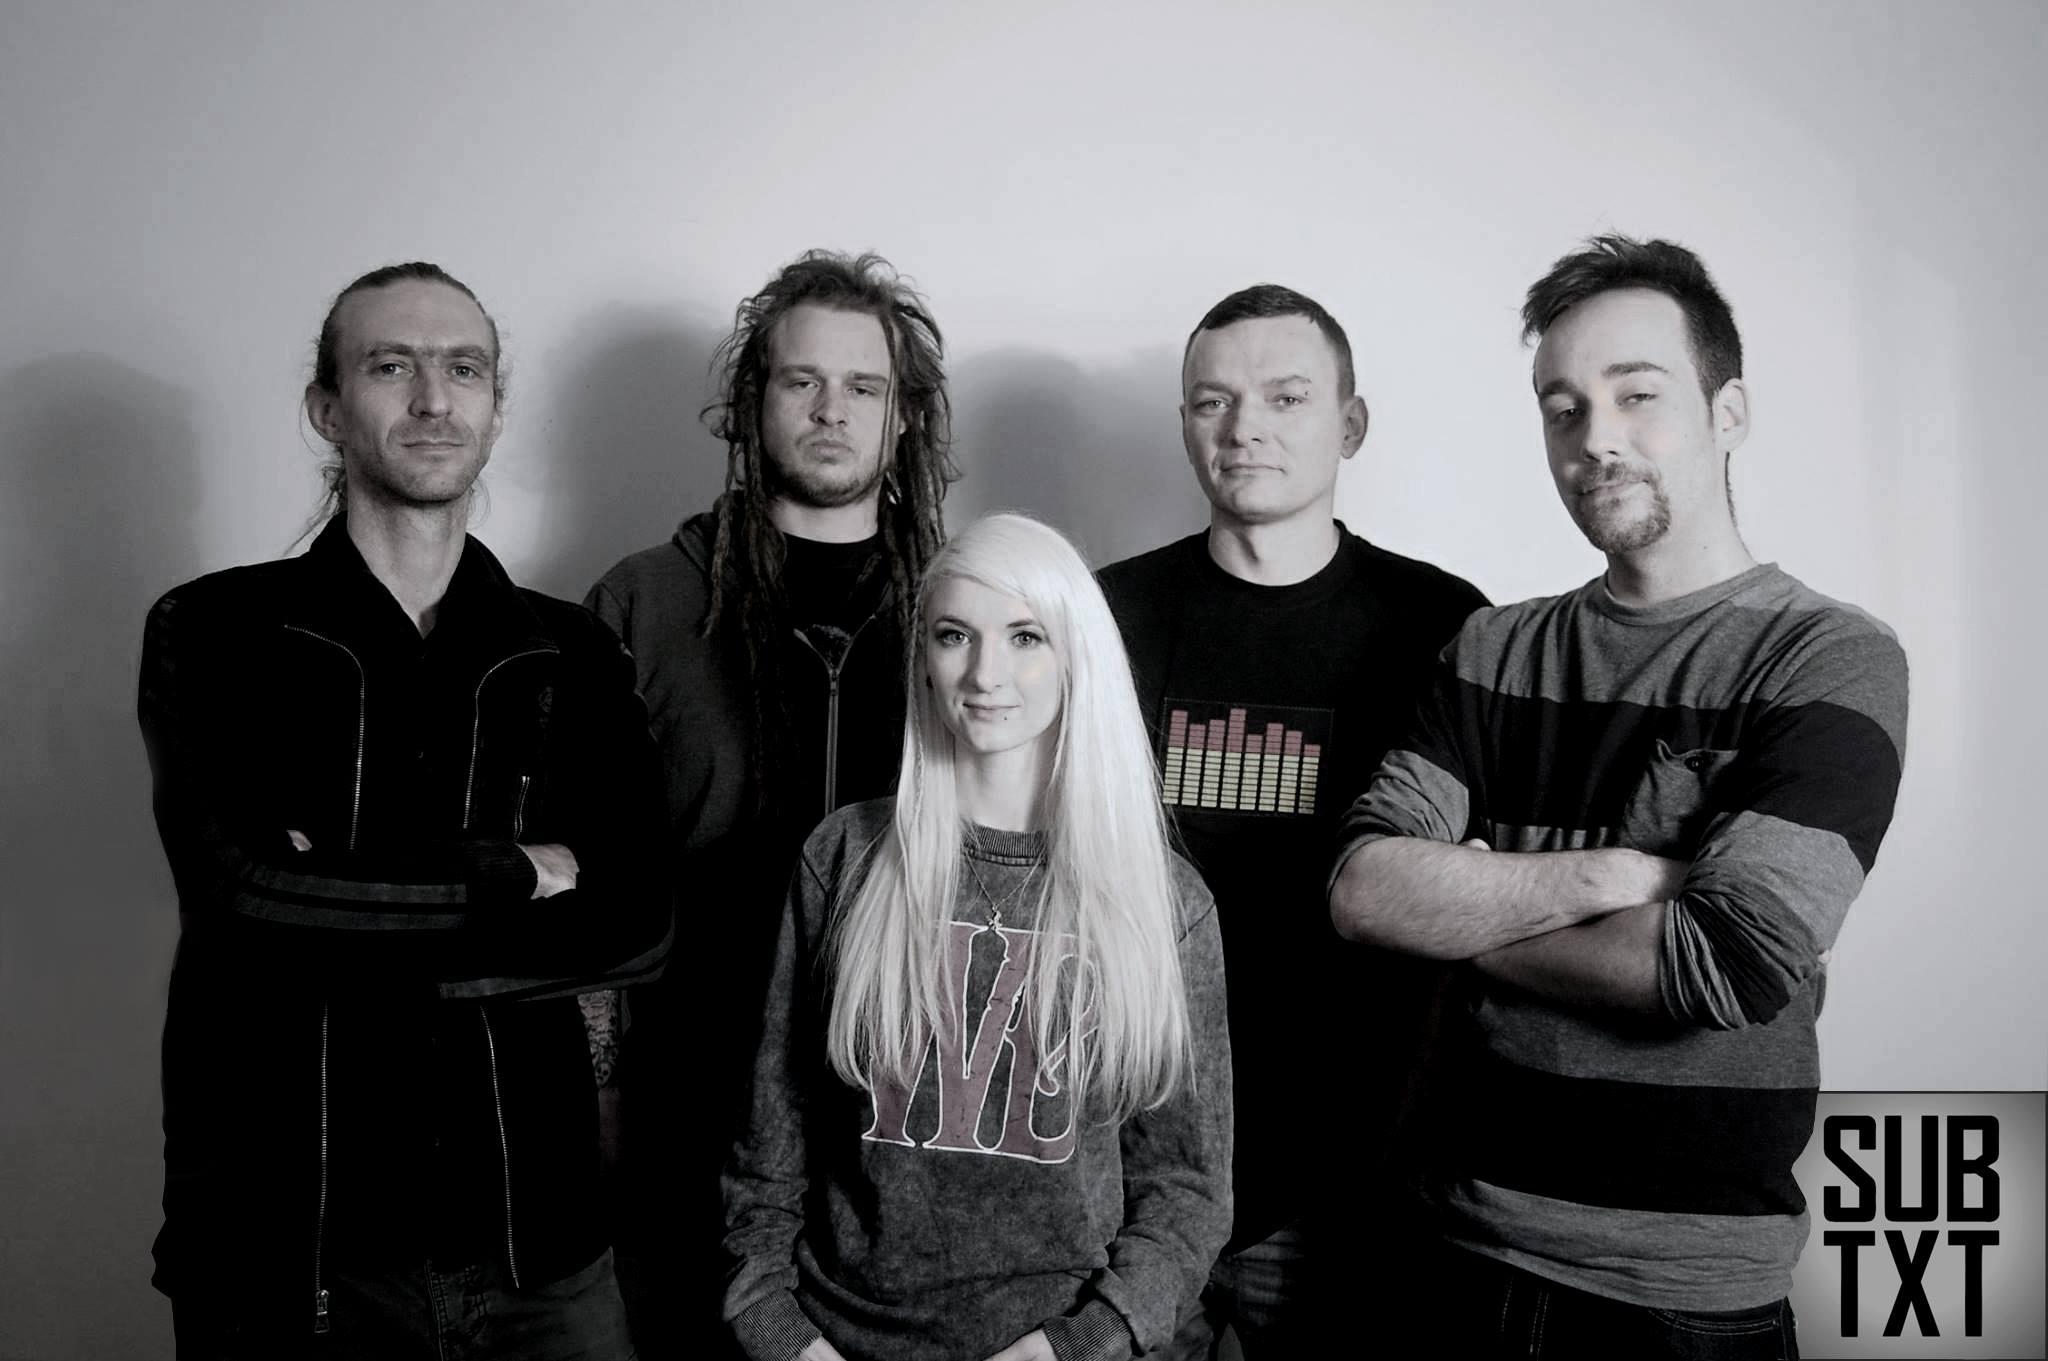 SUBTXT - Band